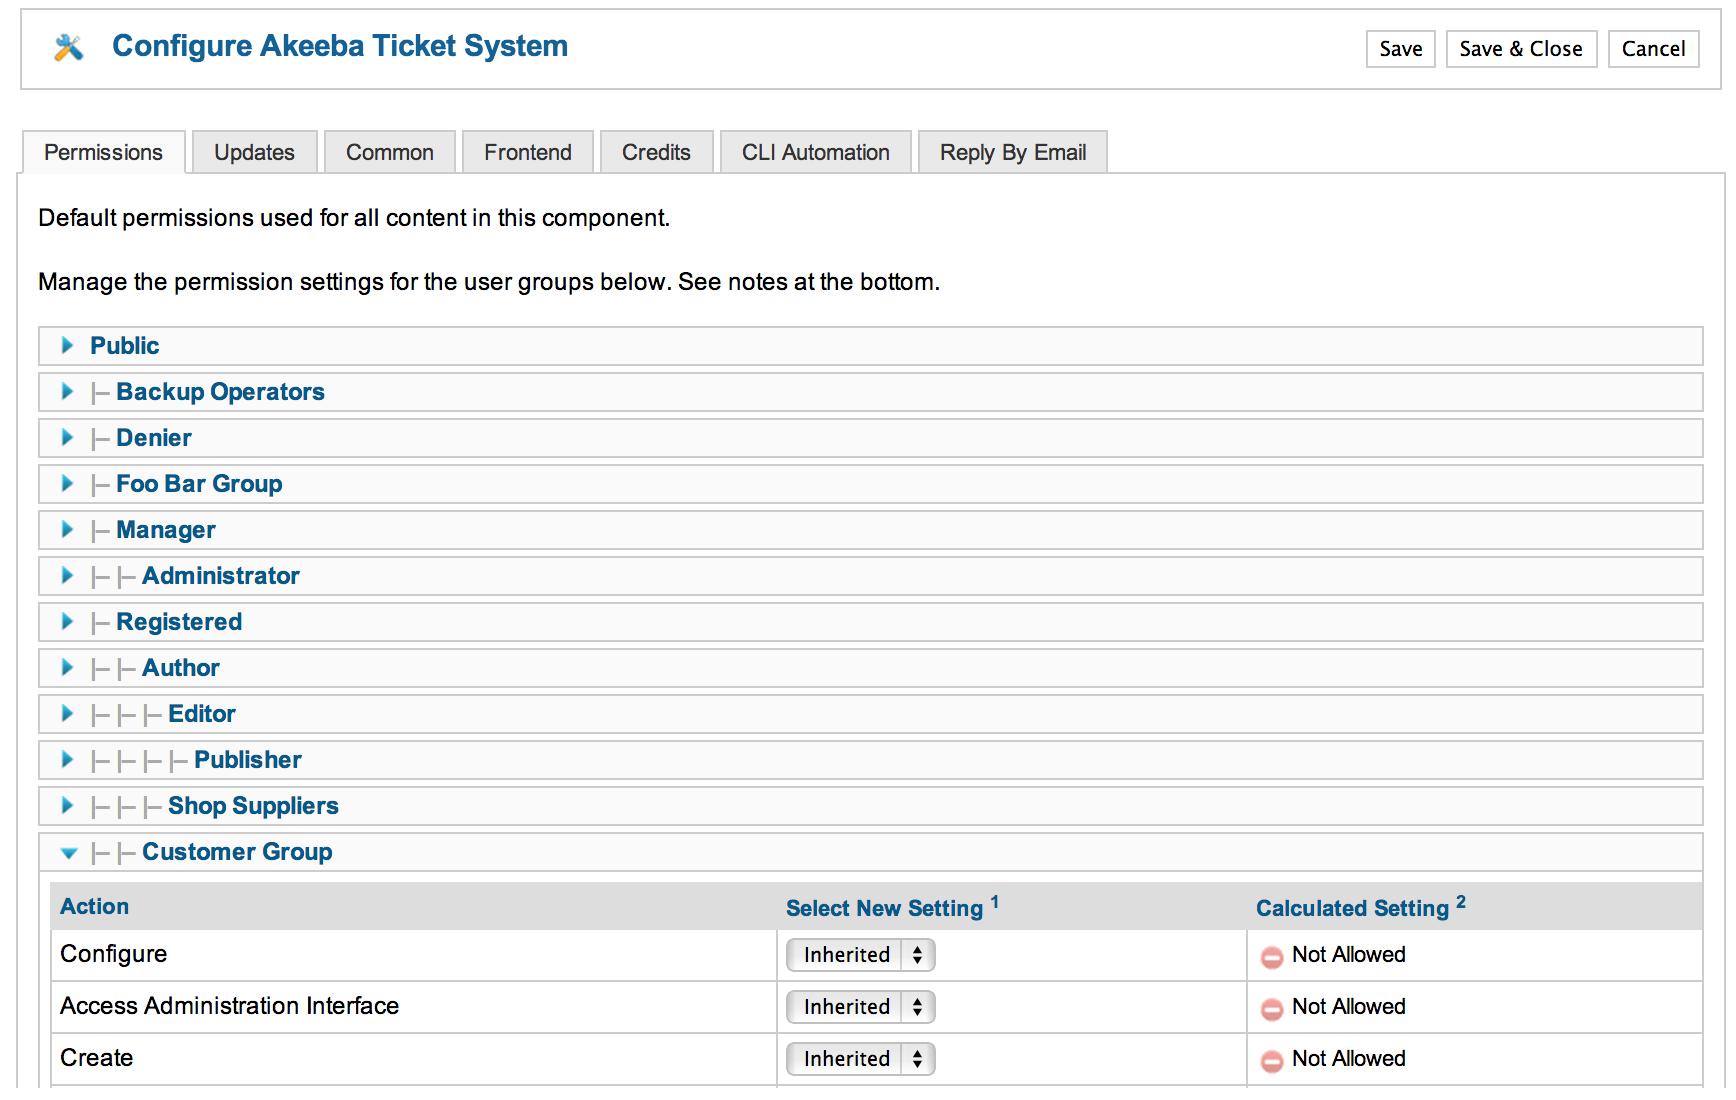 Akeeba Ticket System :: Options